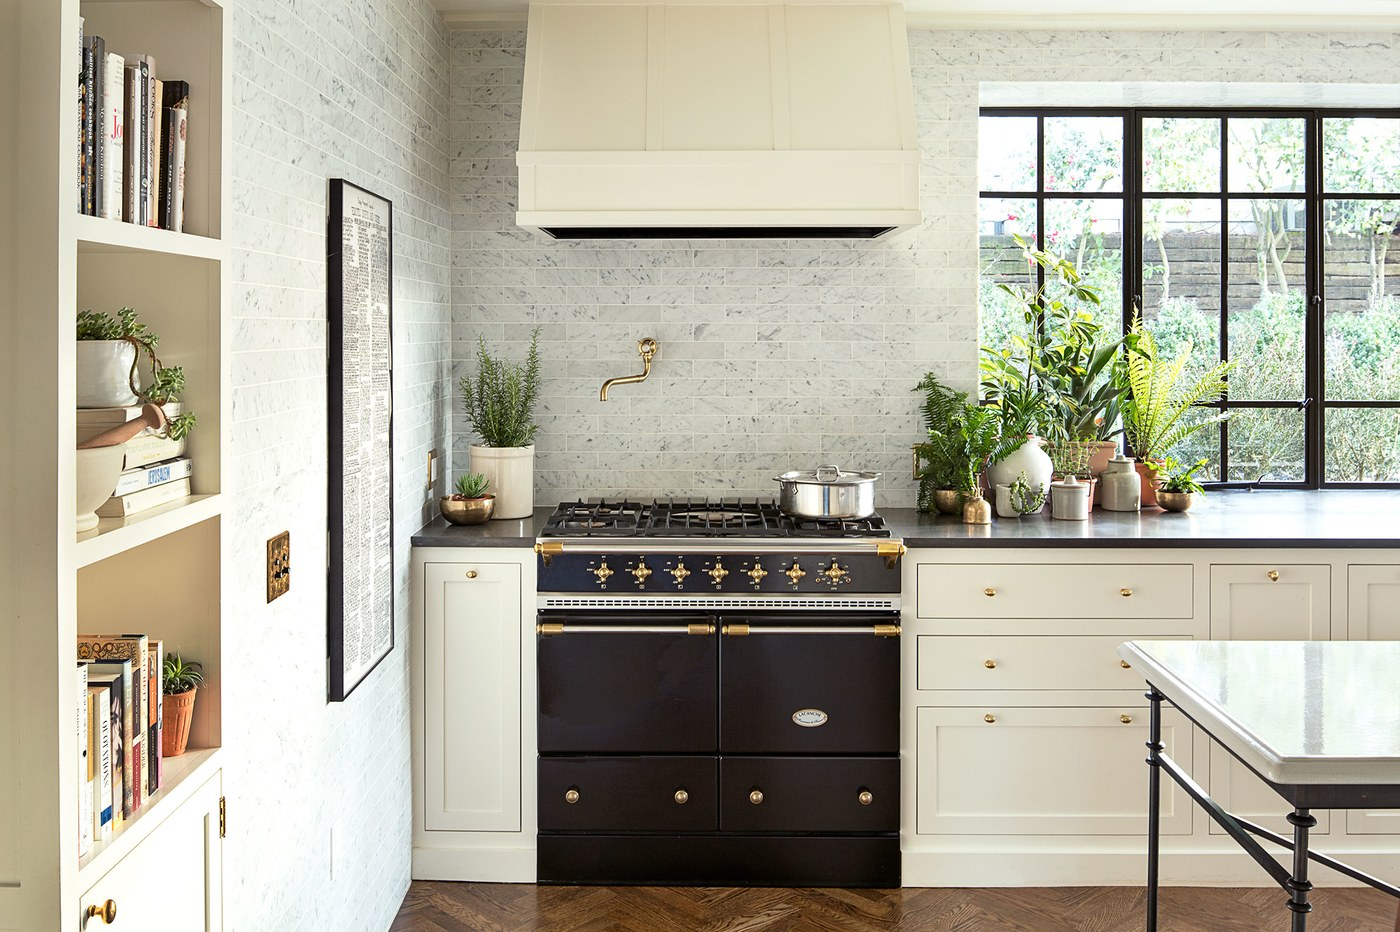 Oregon Home Design by Jessica Helgerson. Kitchen View.